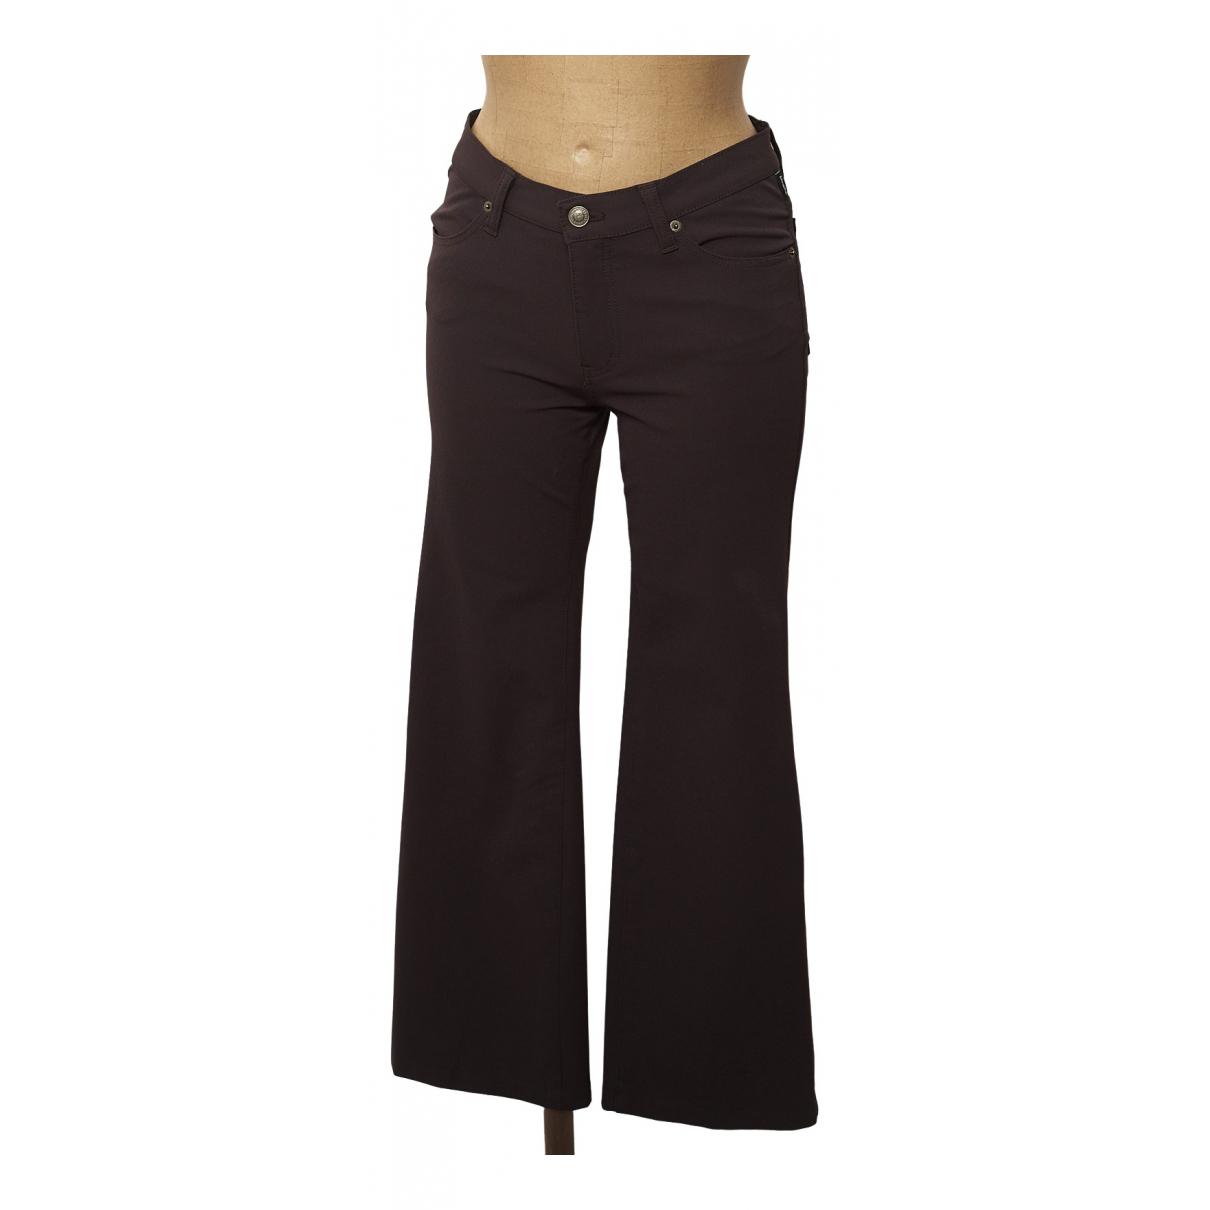 Pantalon en Elastano Marron Versace Jeans